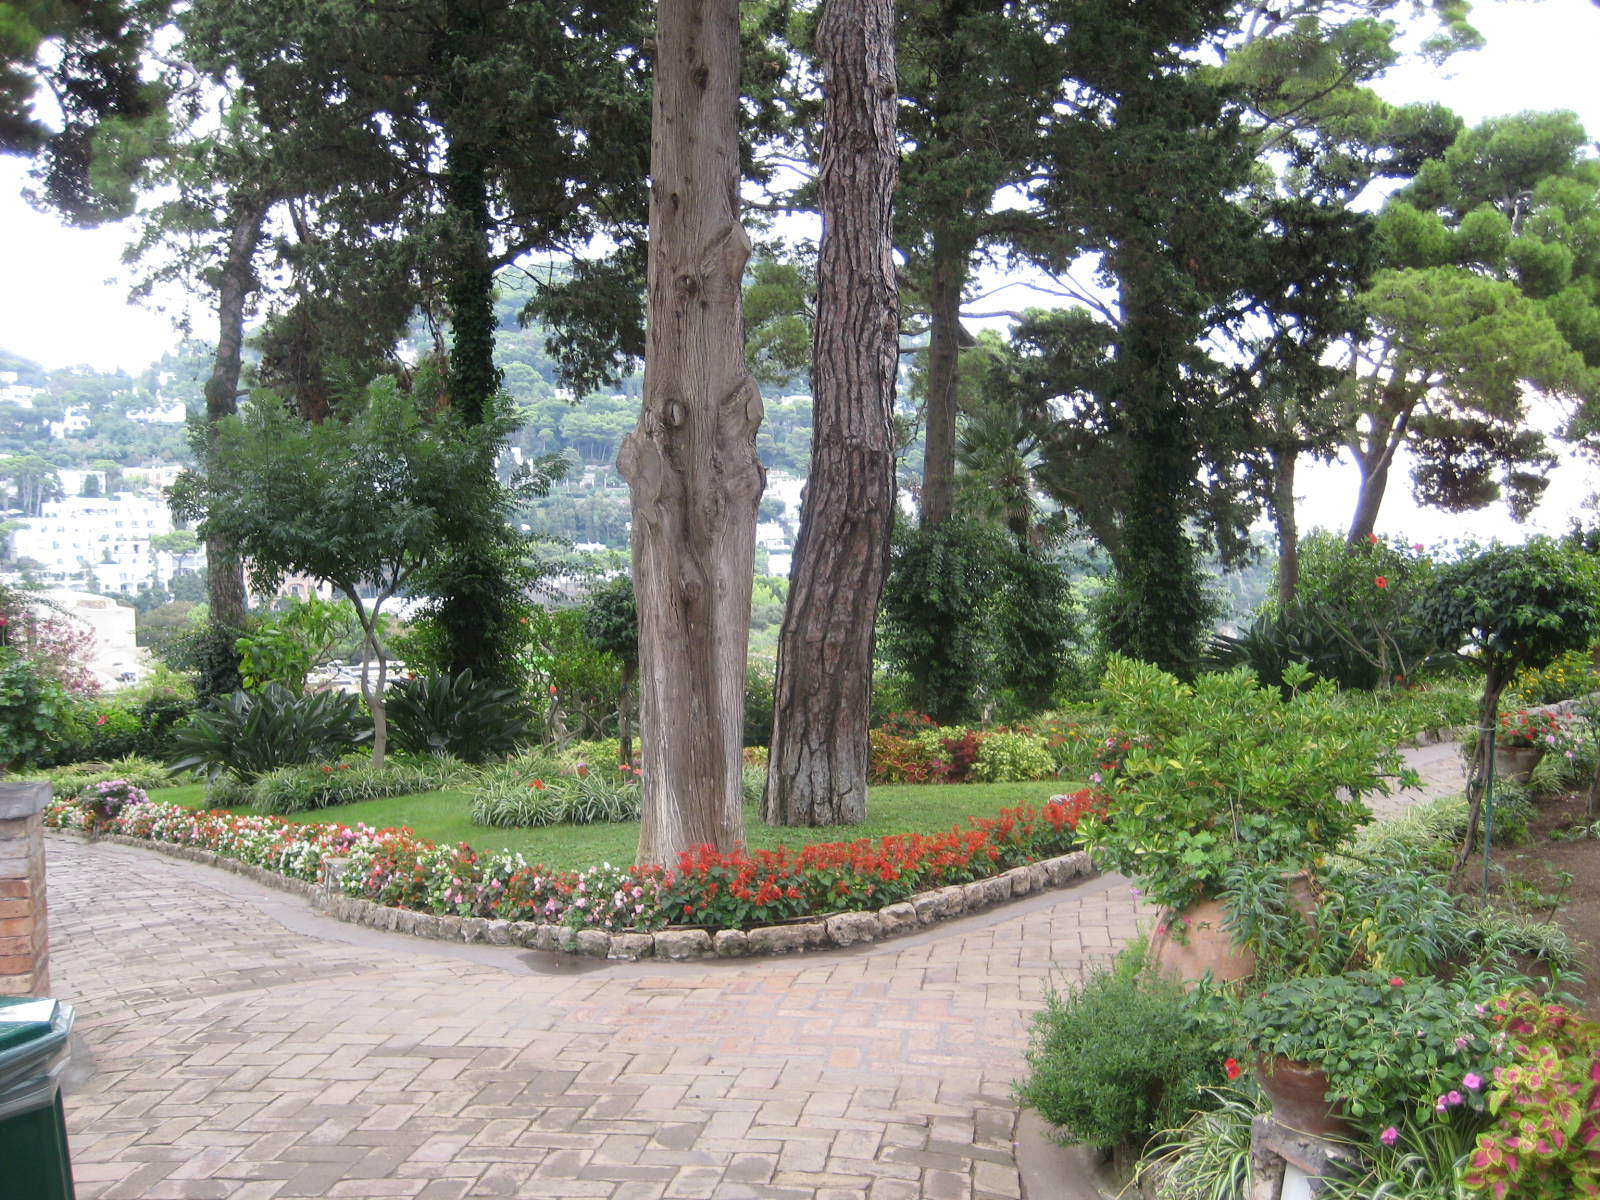 Capri, Italy 8